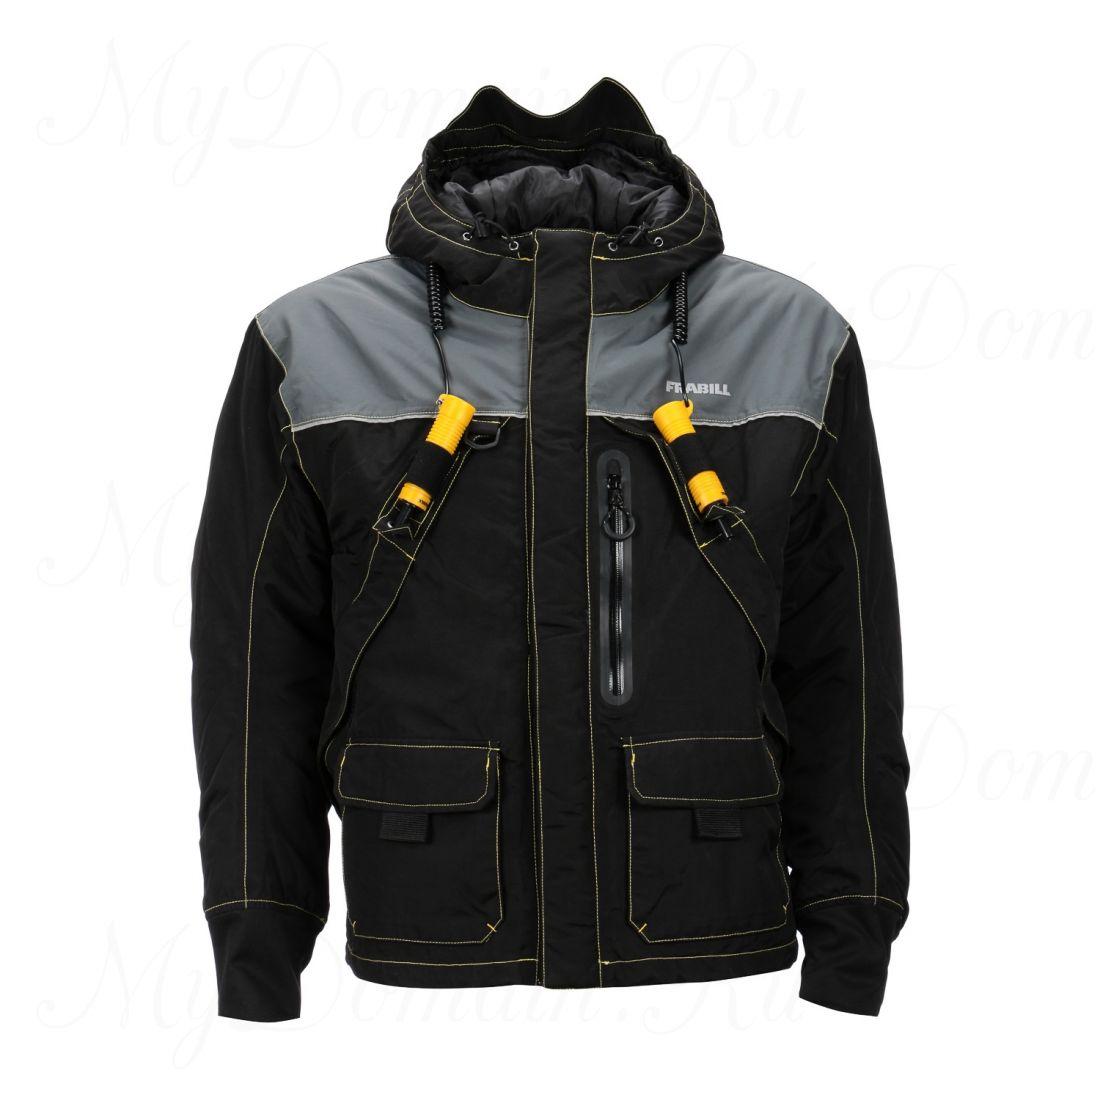 Куртка зимняя Frabill I3 Jacket, Black размер L